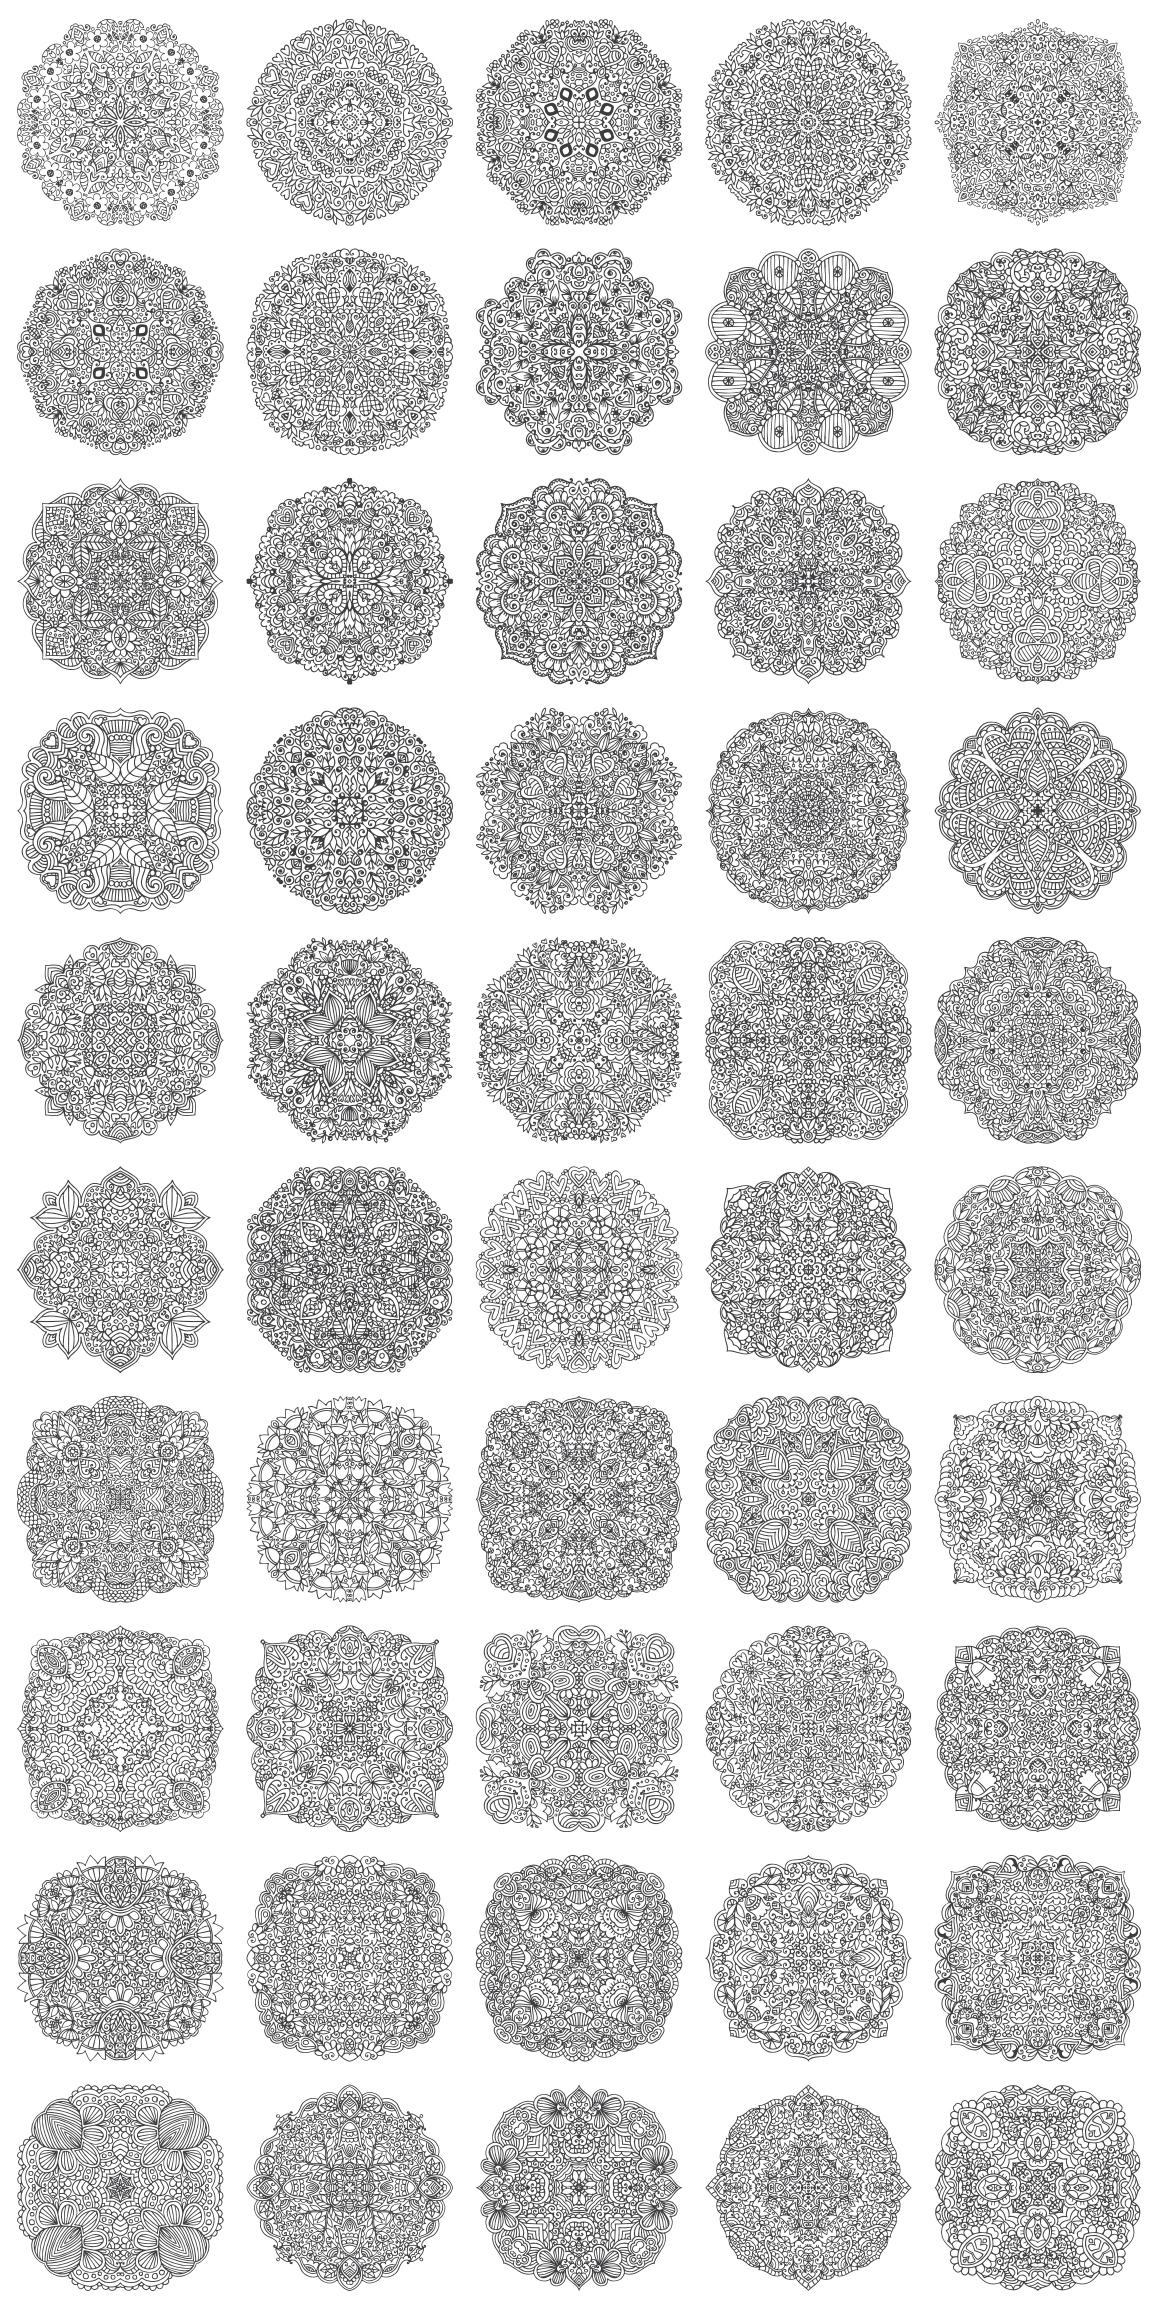 100 Vector Mandalas Round Ornaments example image 2